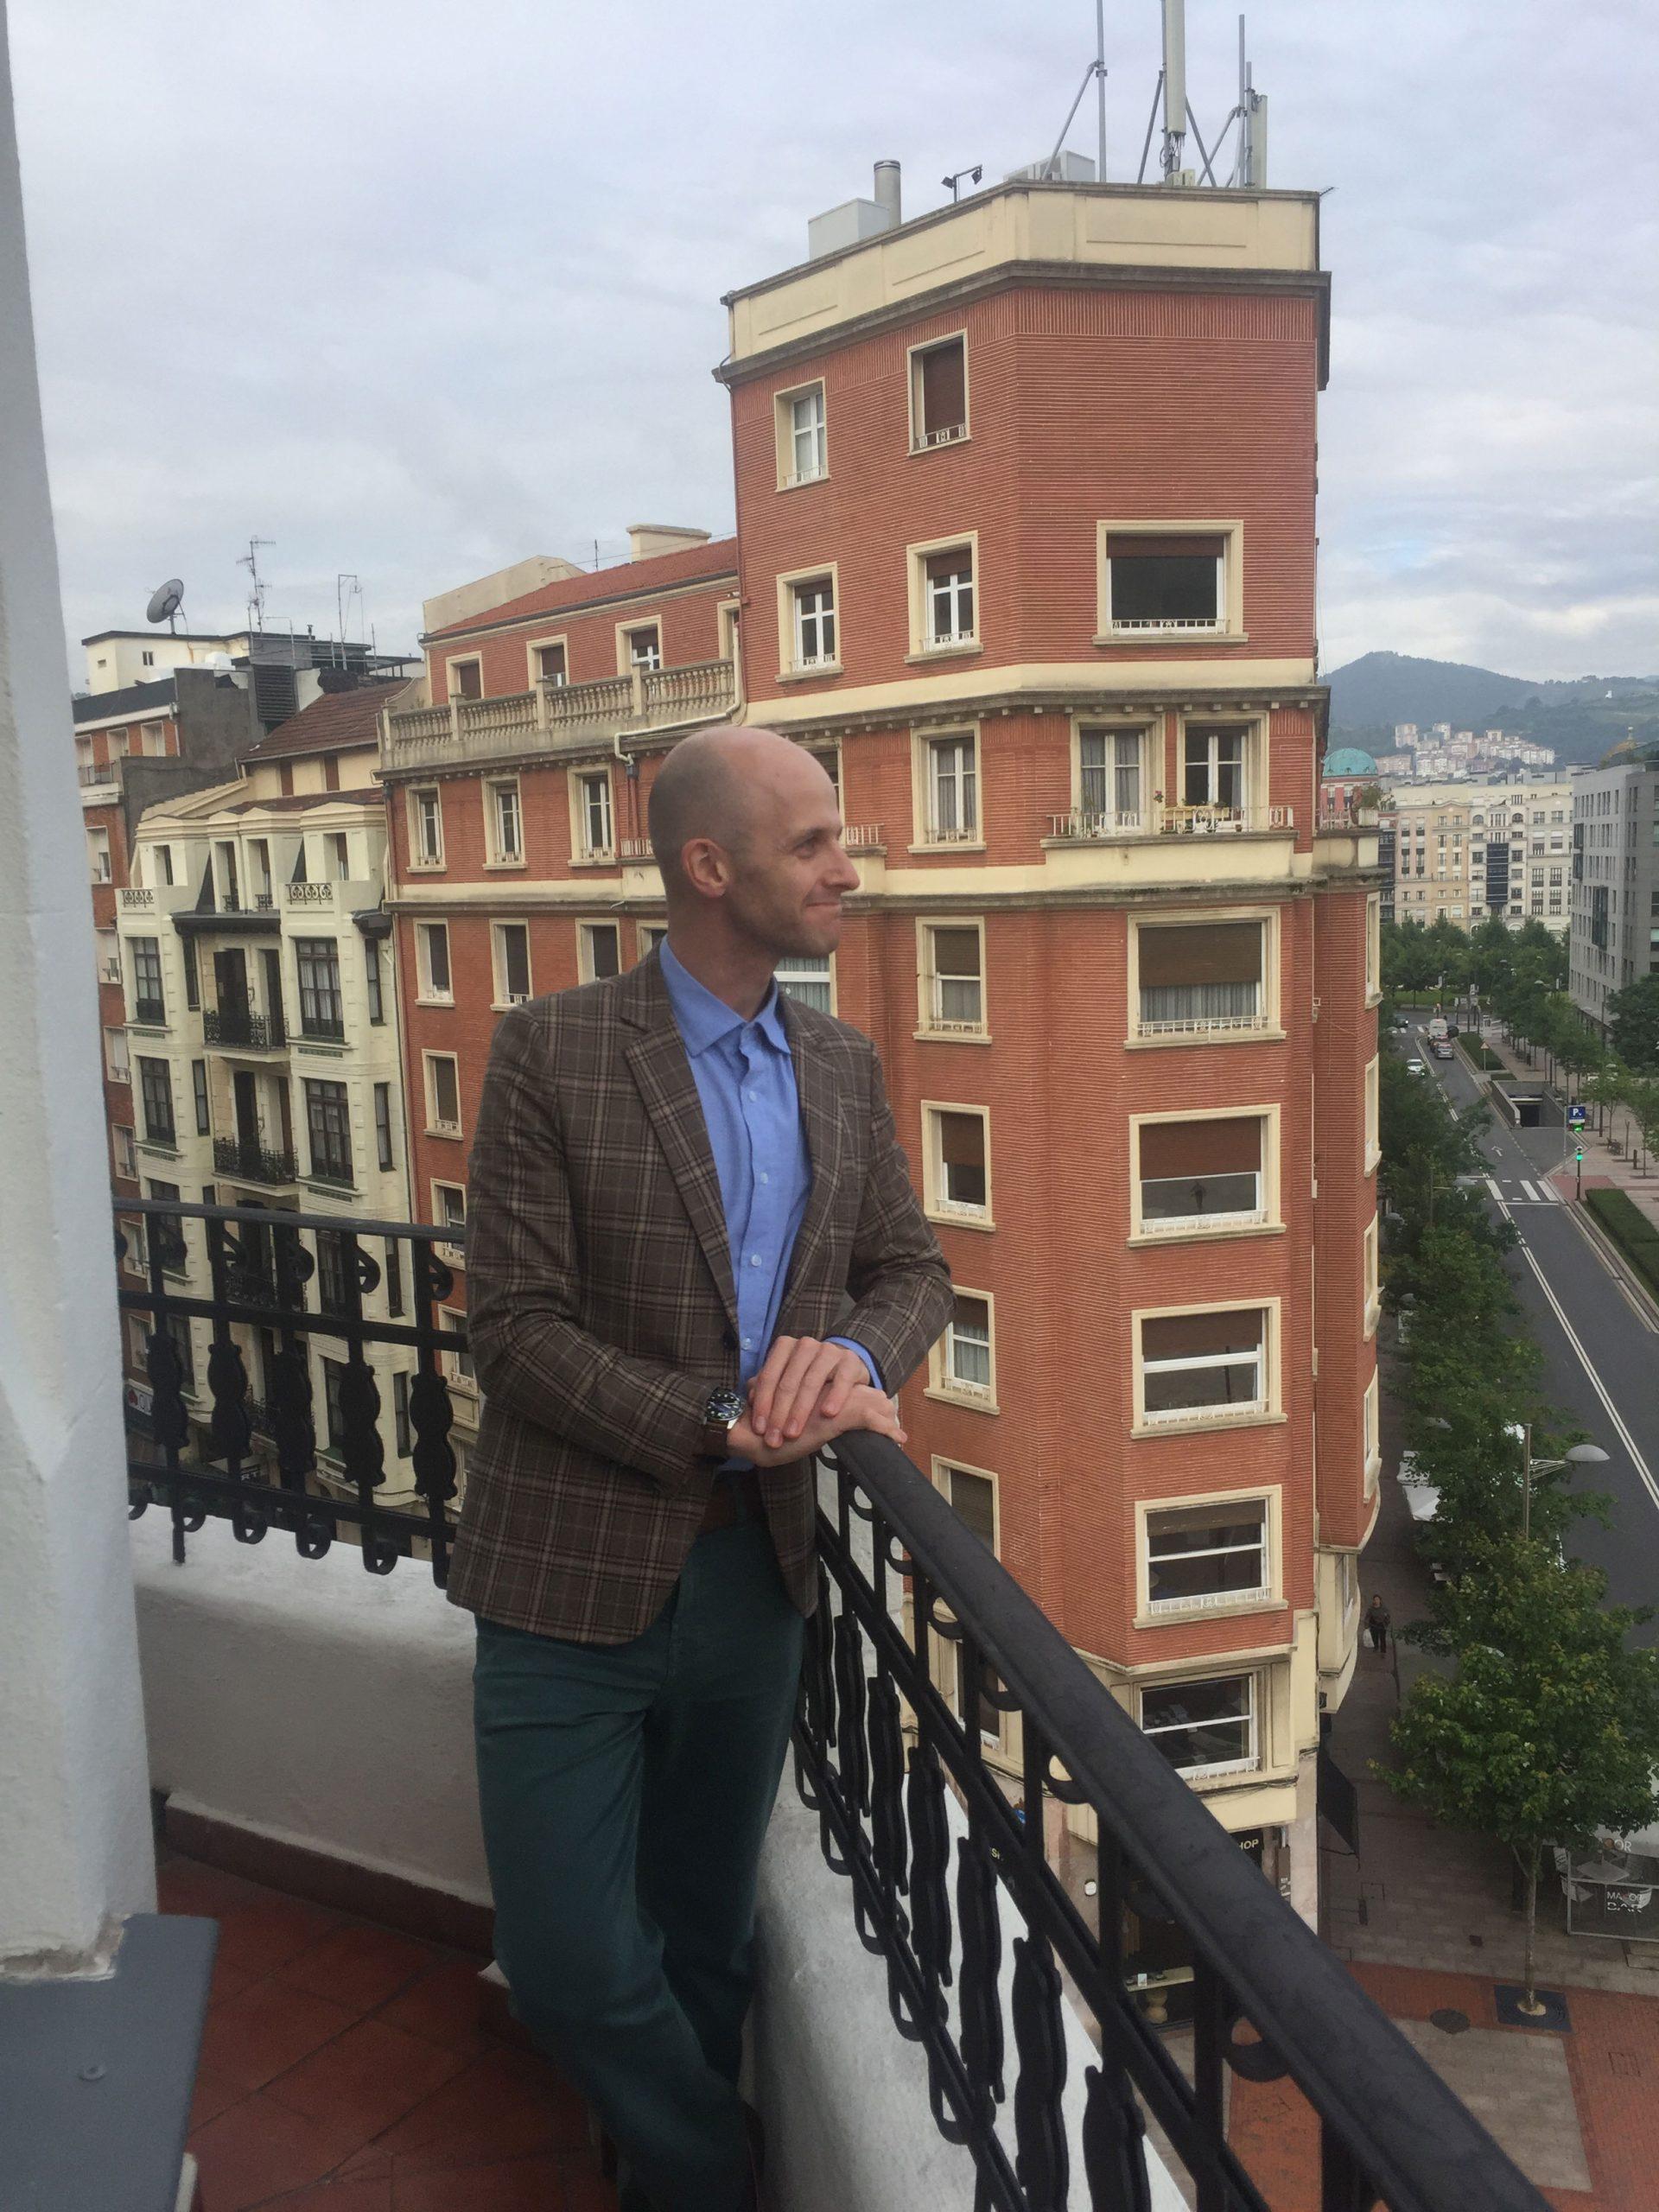 Bilbao James Bond location